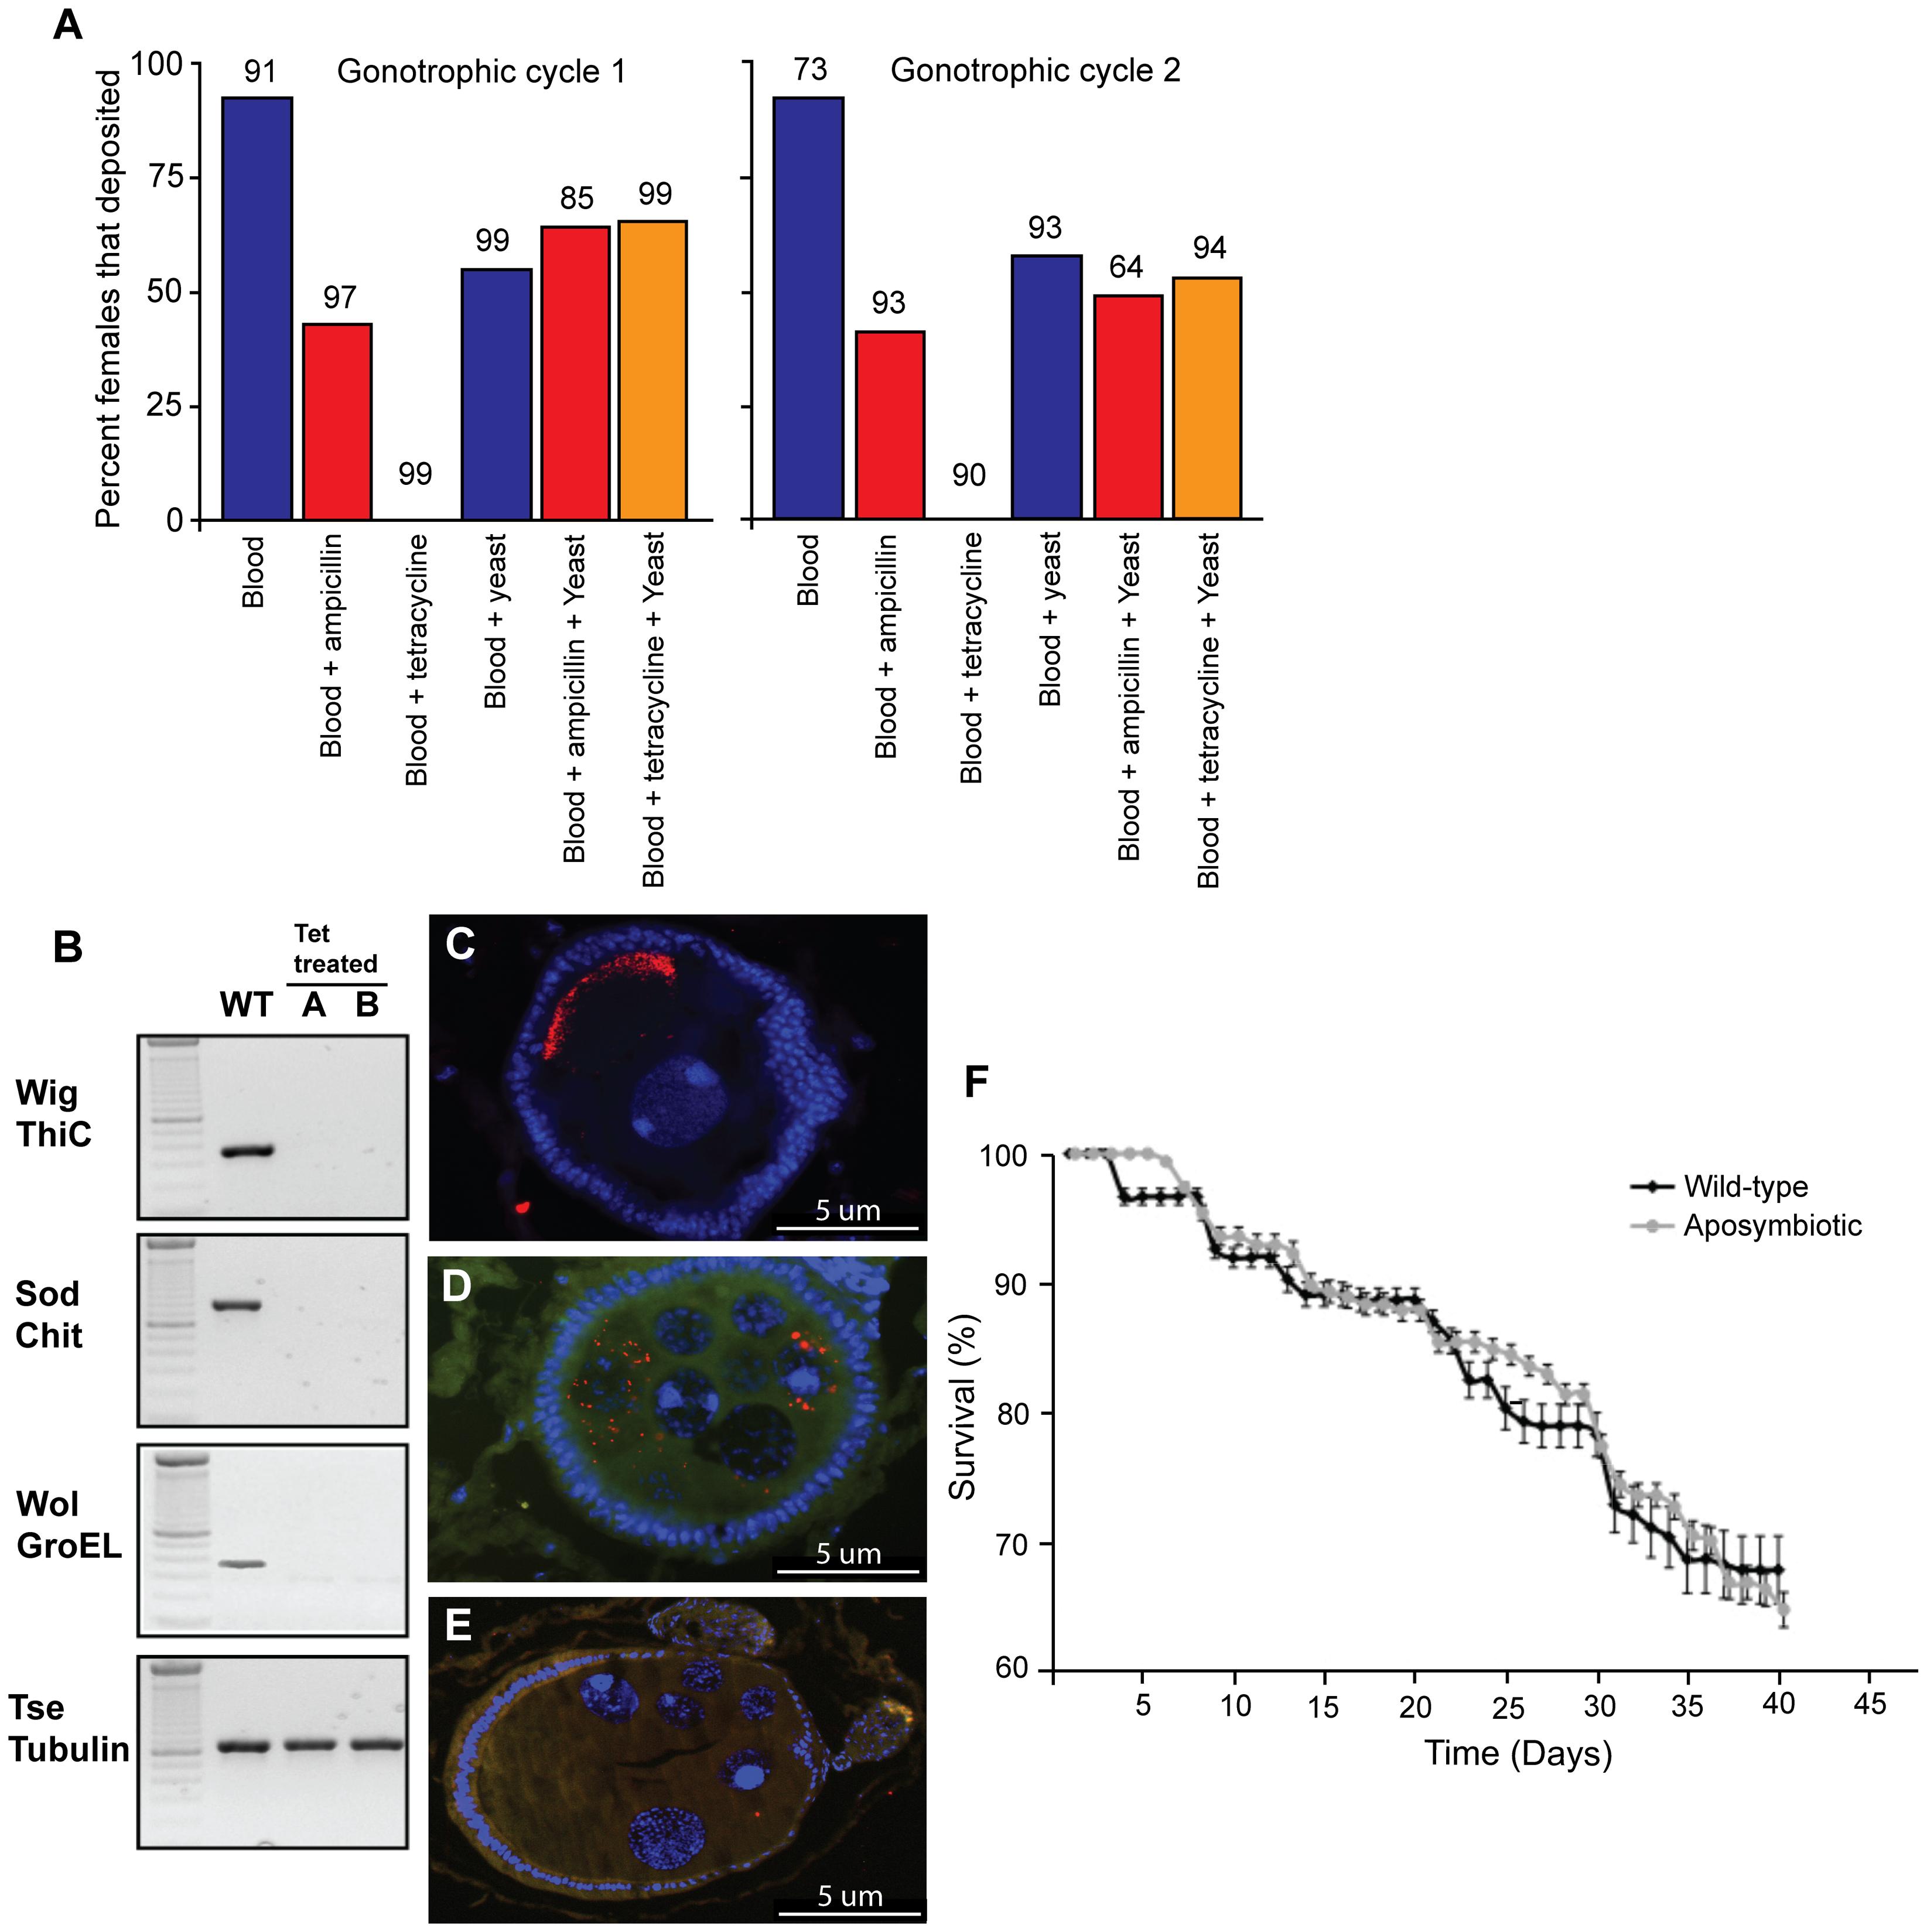 The effects of antibiotic treatment on <i>G. m. morsitans.</i>